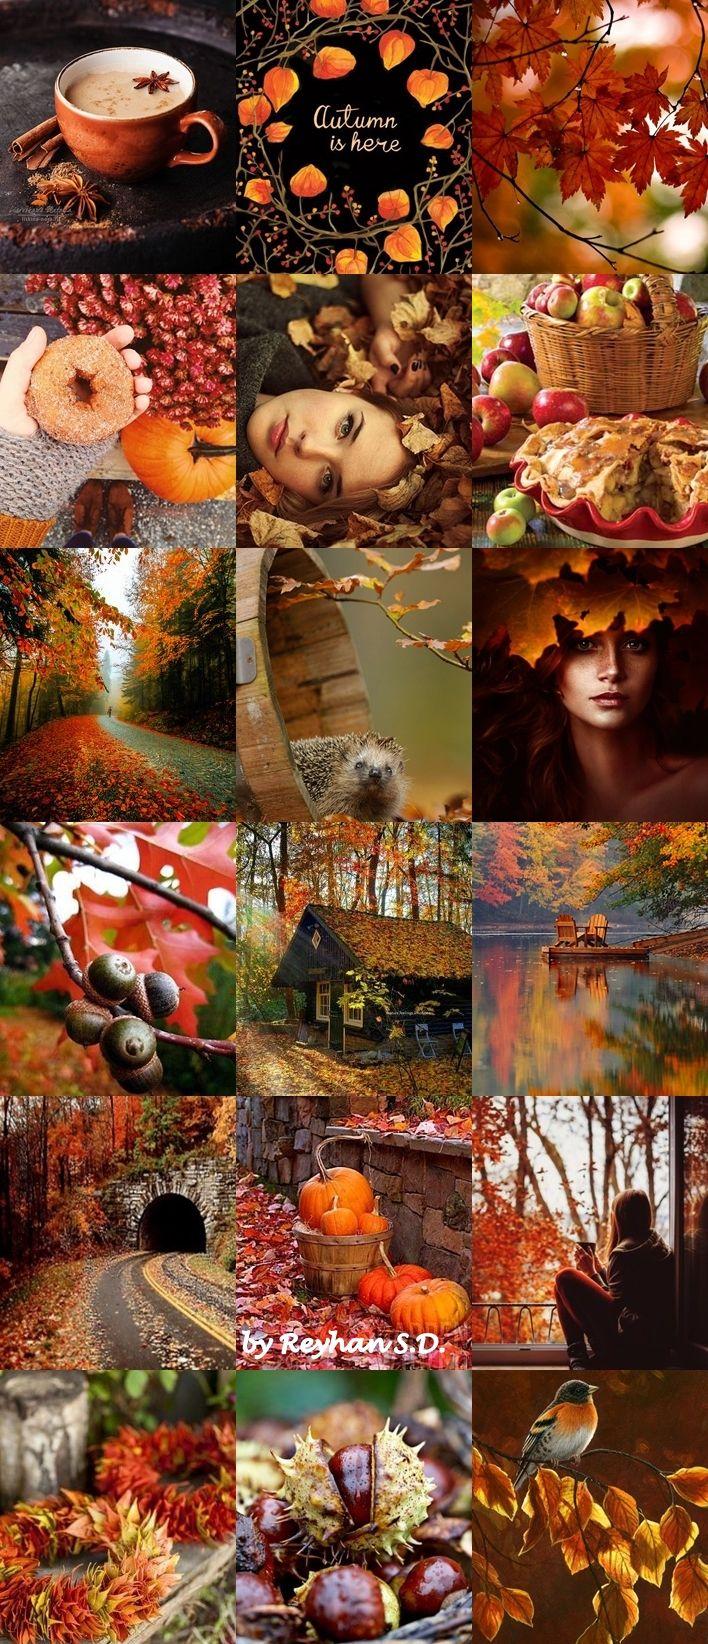 '' Colorful Autumn '' by Reyhan Seran Dursun